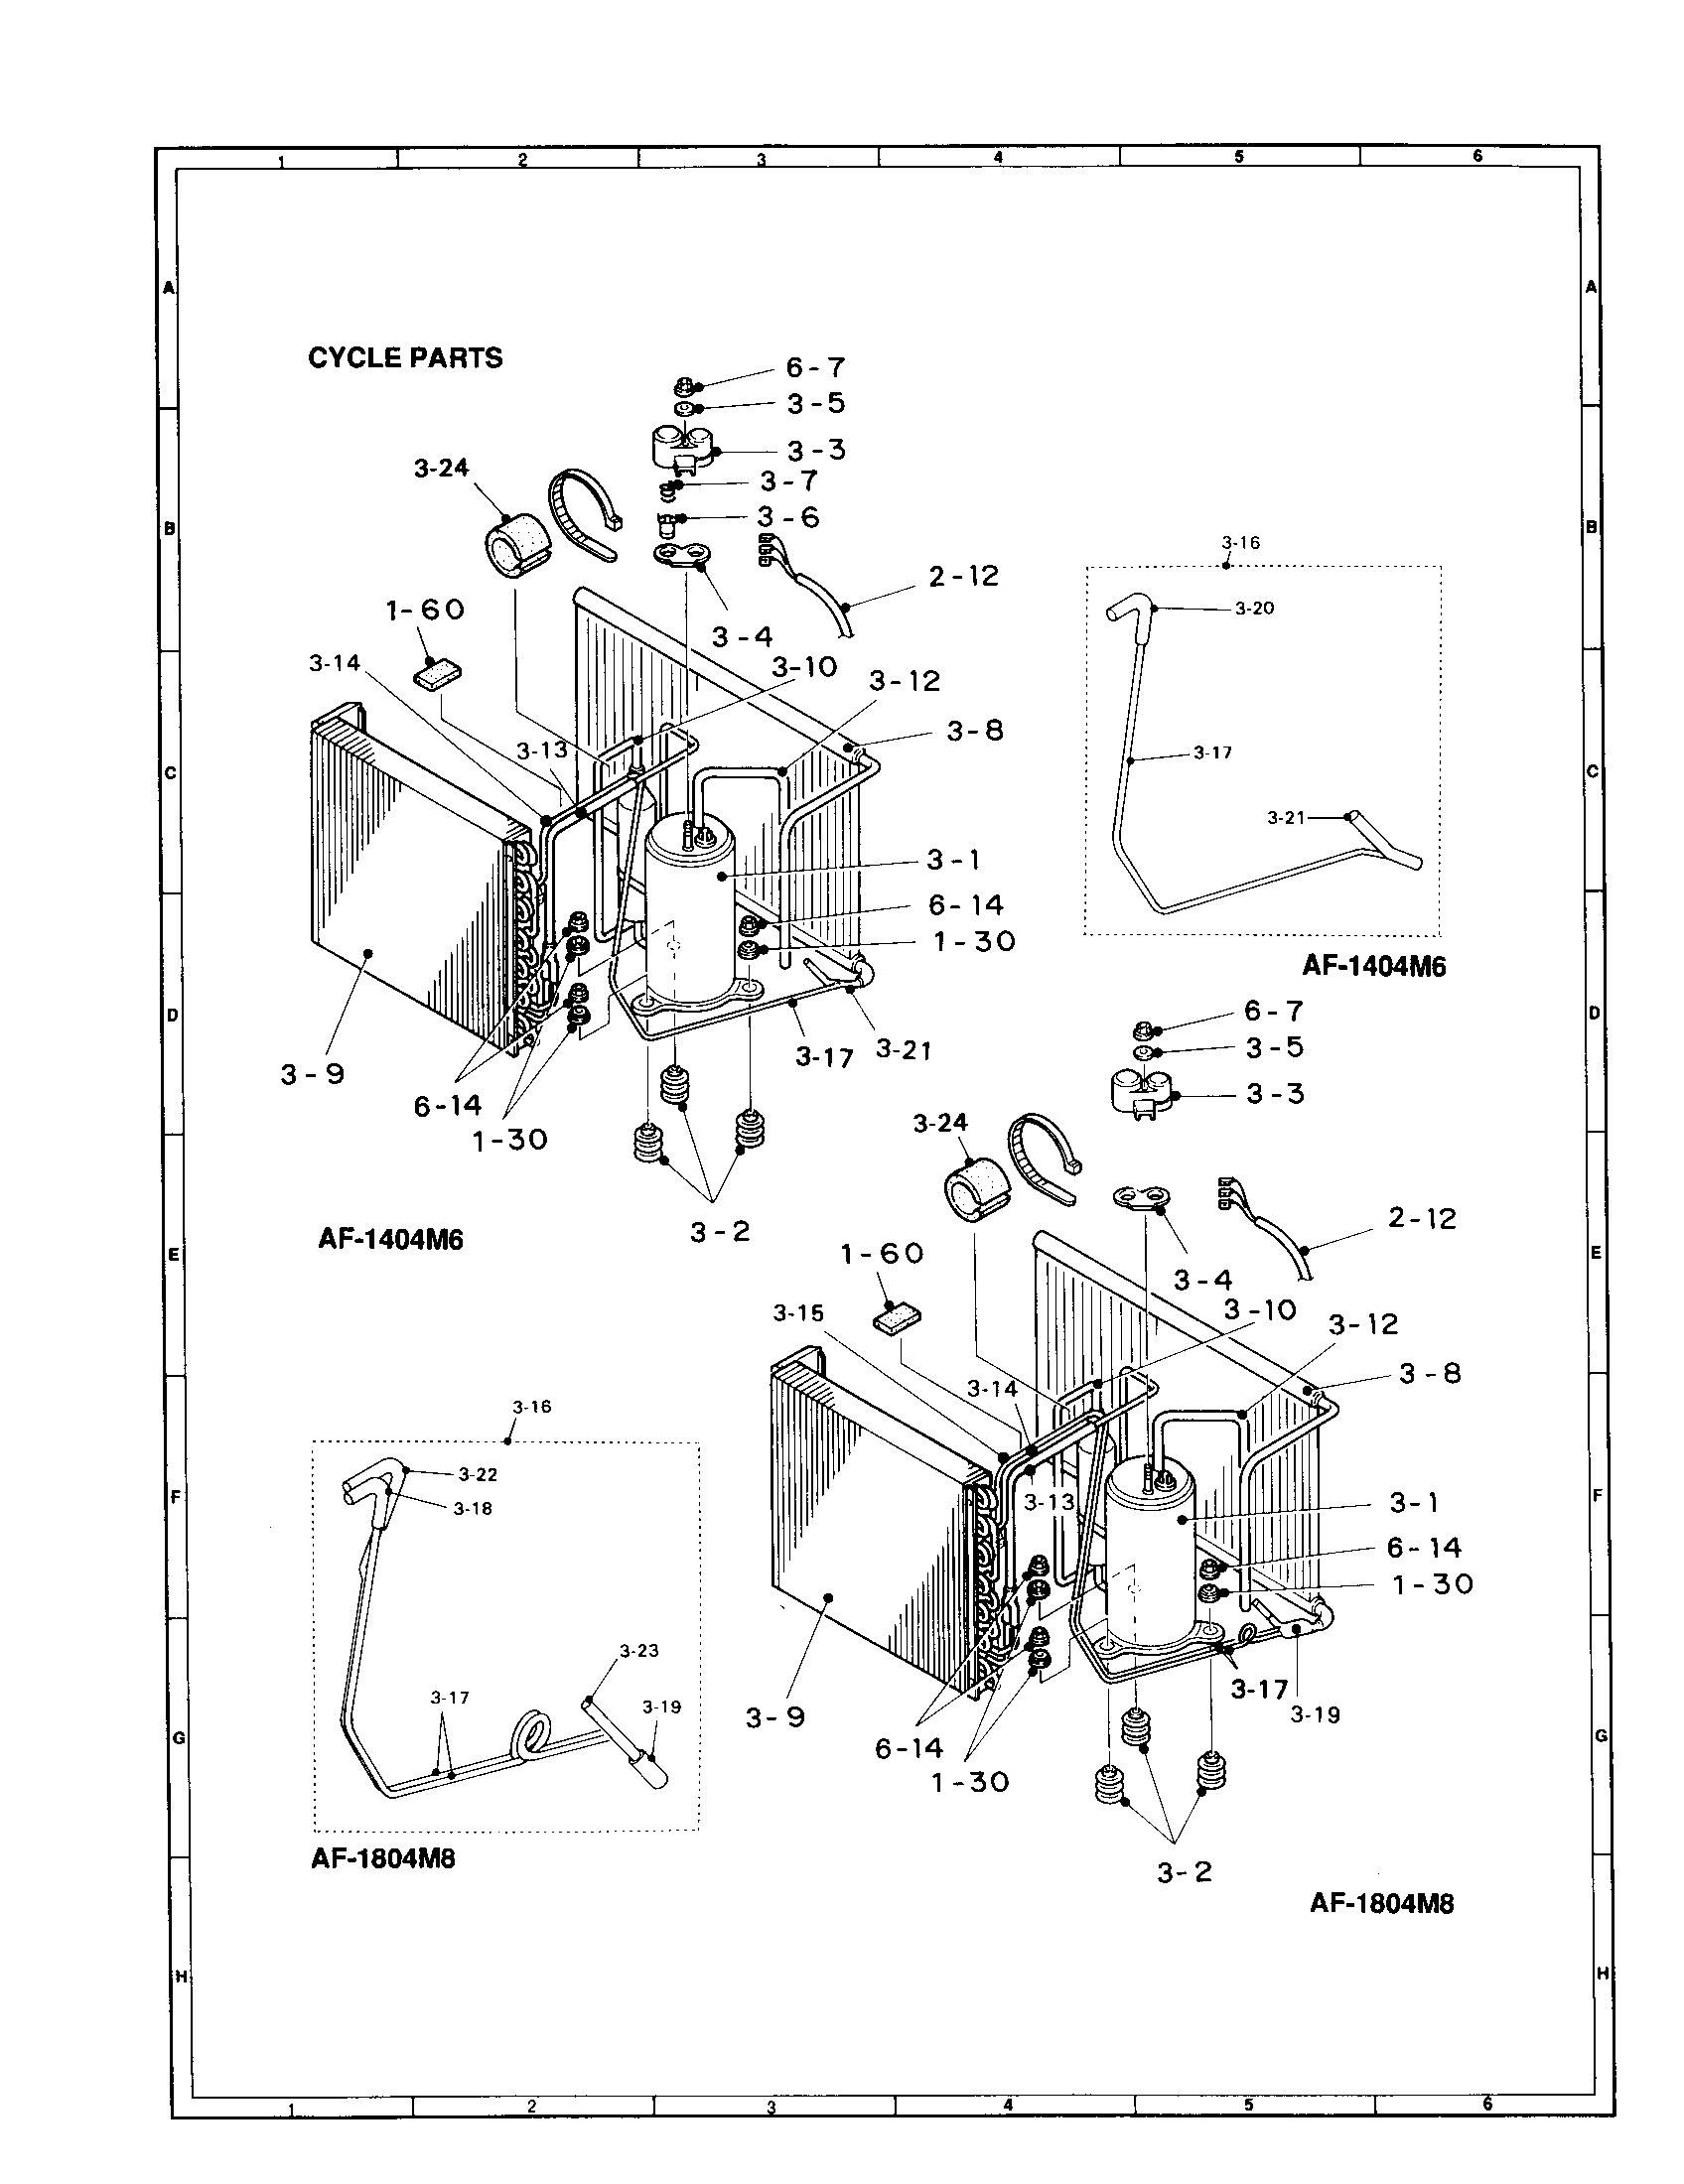 air conditioning components diagram fujitsu mini split wiring sharp conditioner parts model af